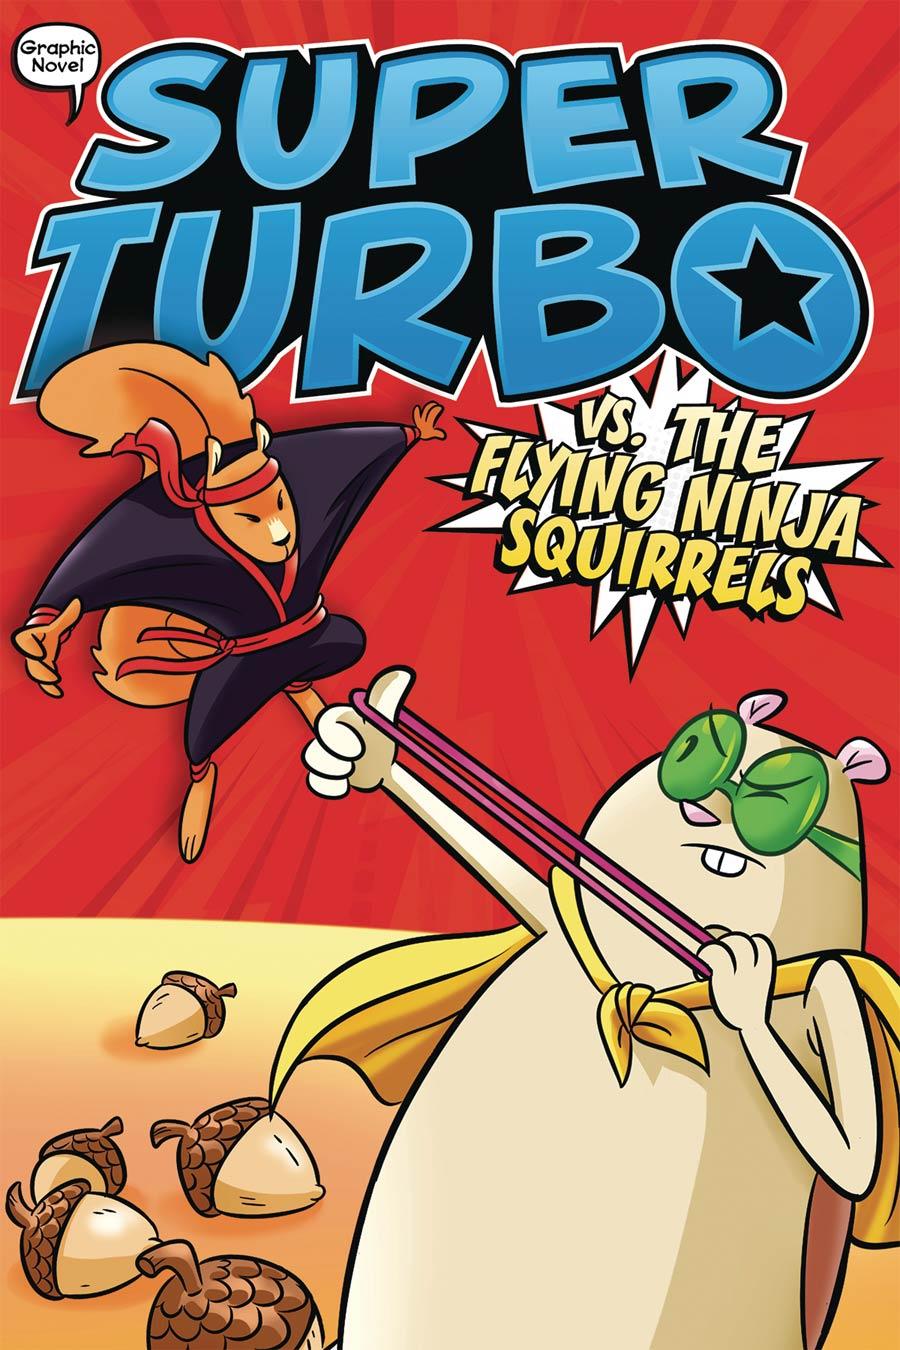 Super Turbo Vol 2 Super Turbo vs The Flying Ninja Squirrels TP